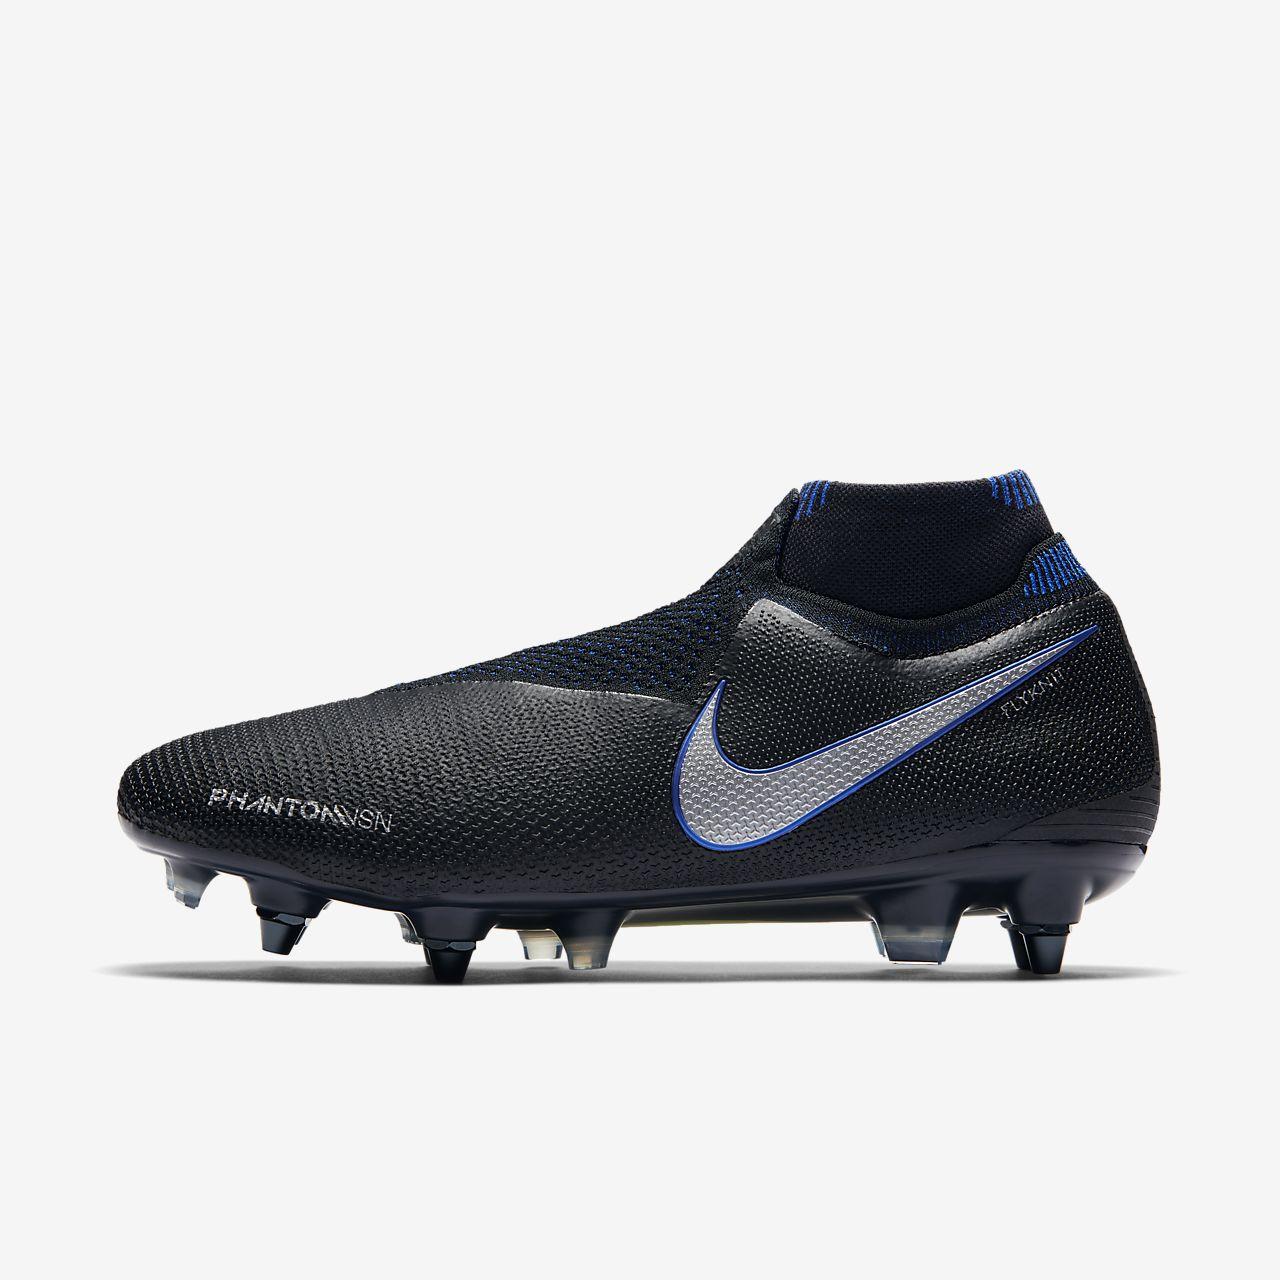 Phantom Clog Calzado Fit De Dynamic Vision Nike Anti Sg Fútbol Elite qqFwHtz 296922308c646